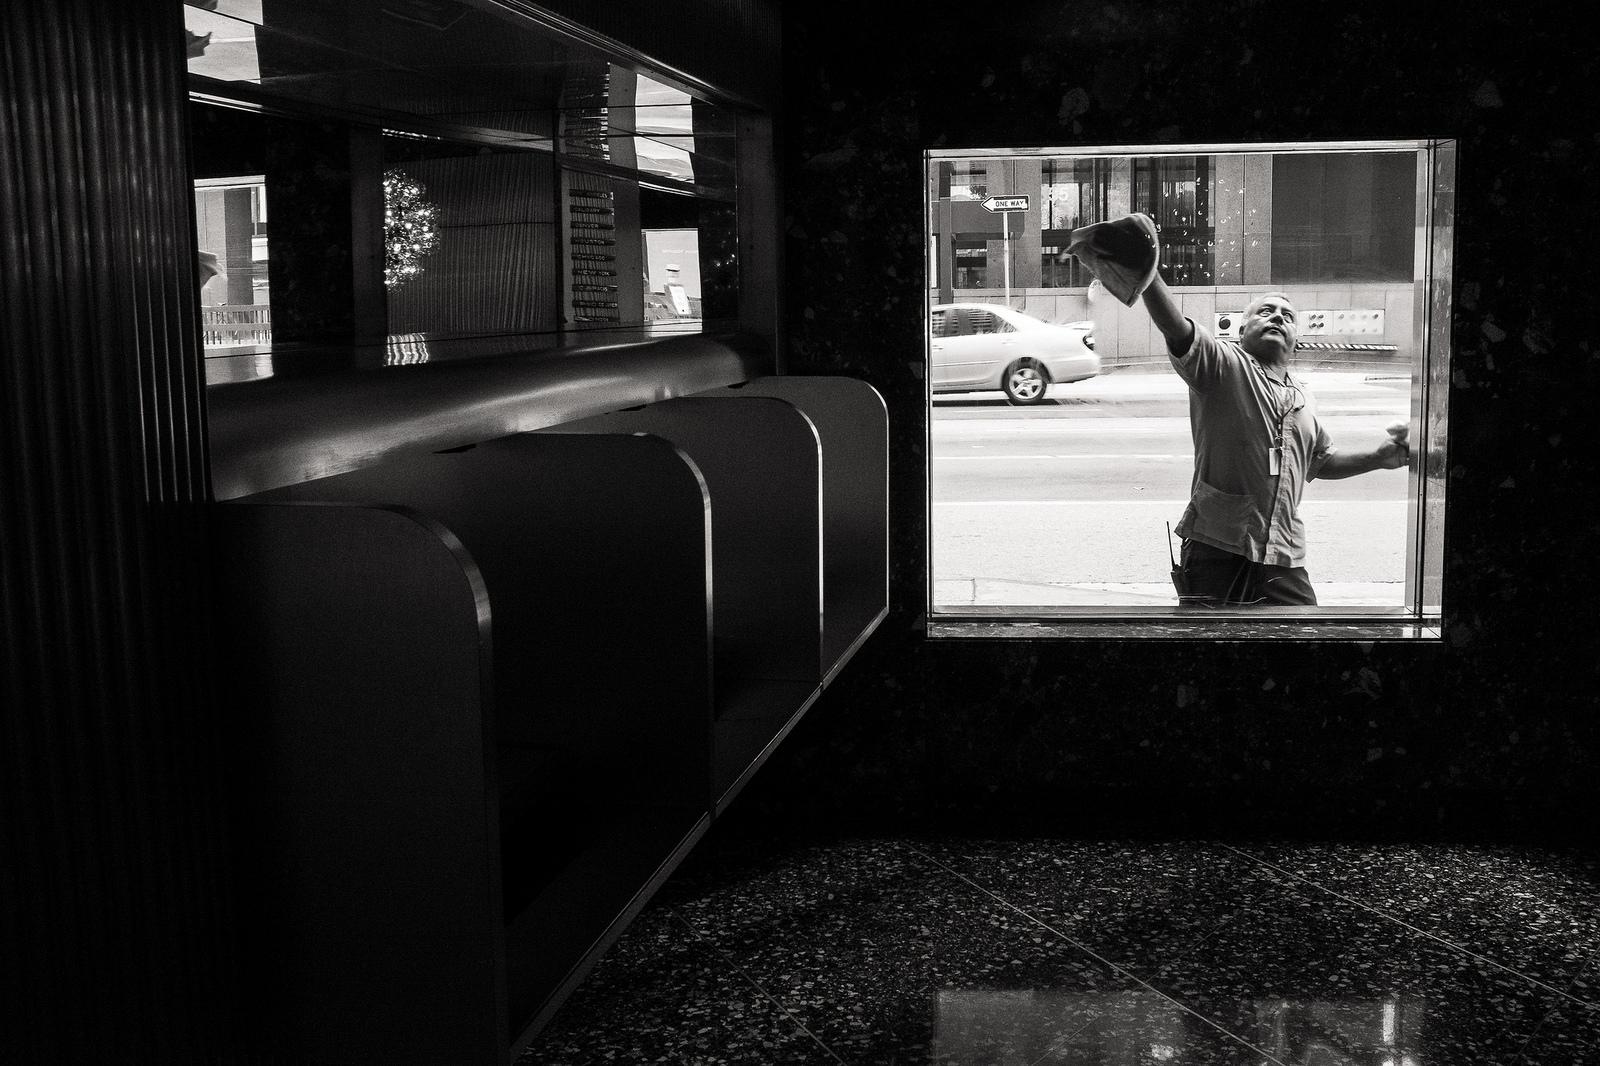 """Buff"" May, 2016. Downtown Los Angeles  Fujifilm X100s, 23mm, f/8, 1/100, ISO 6400"